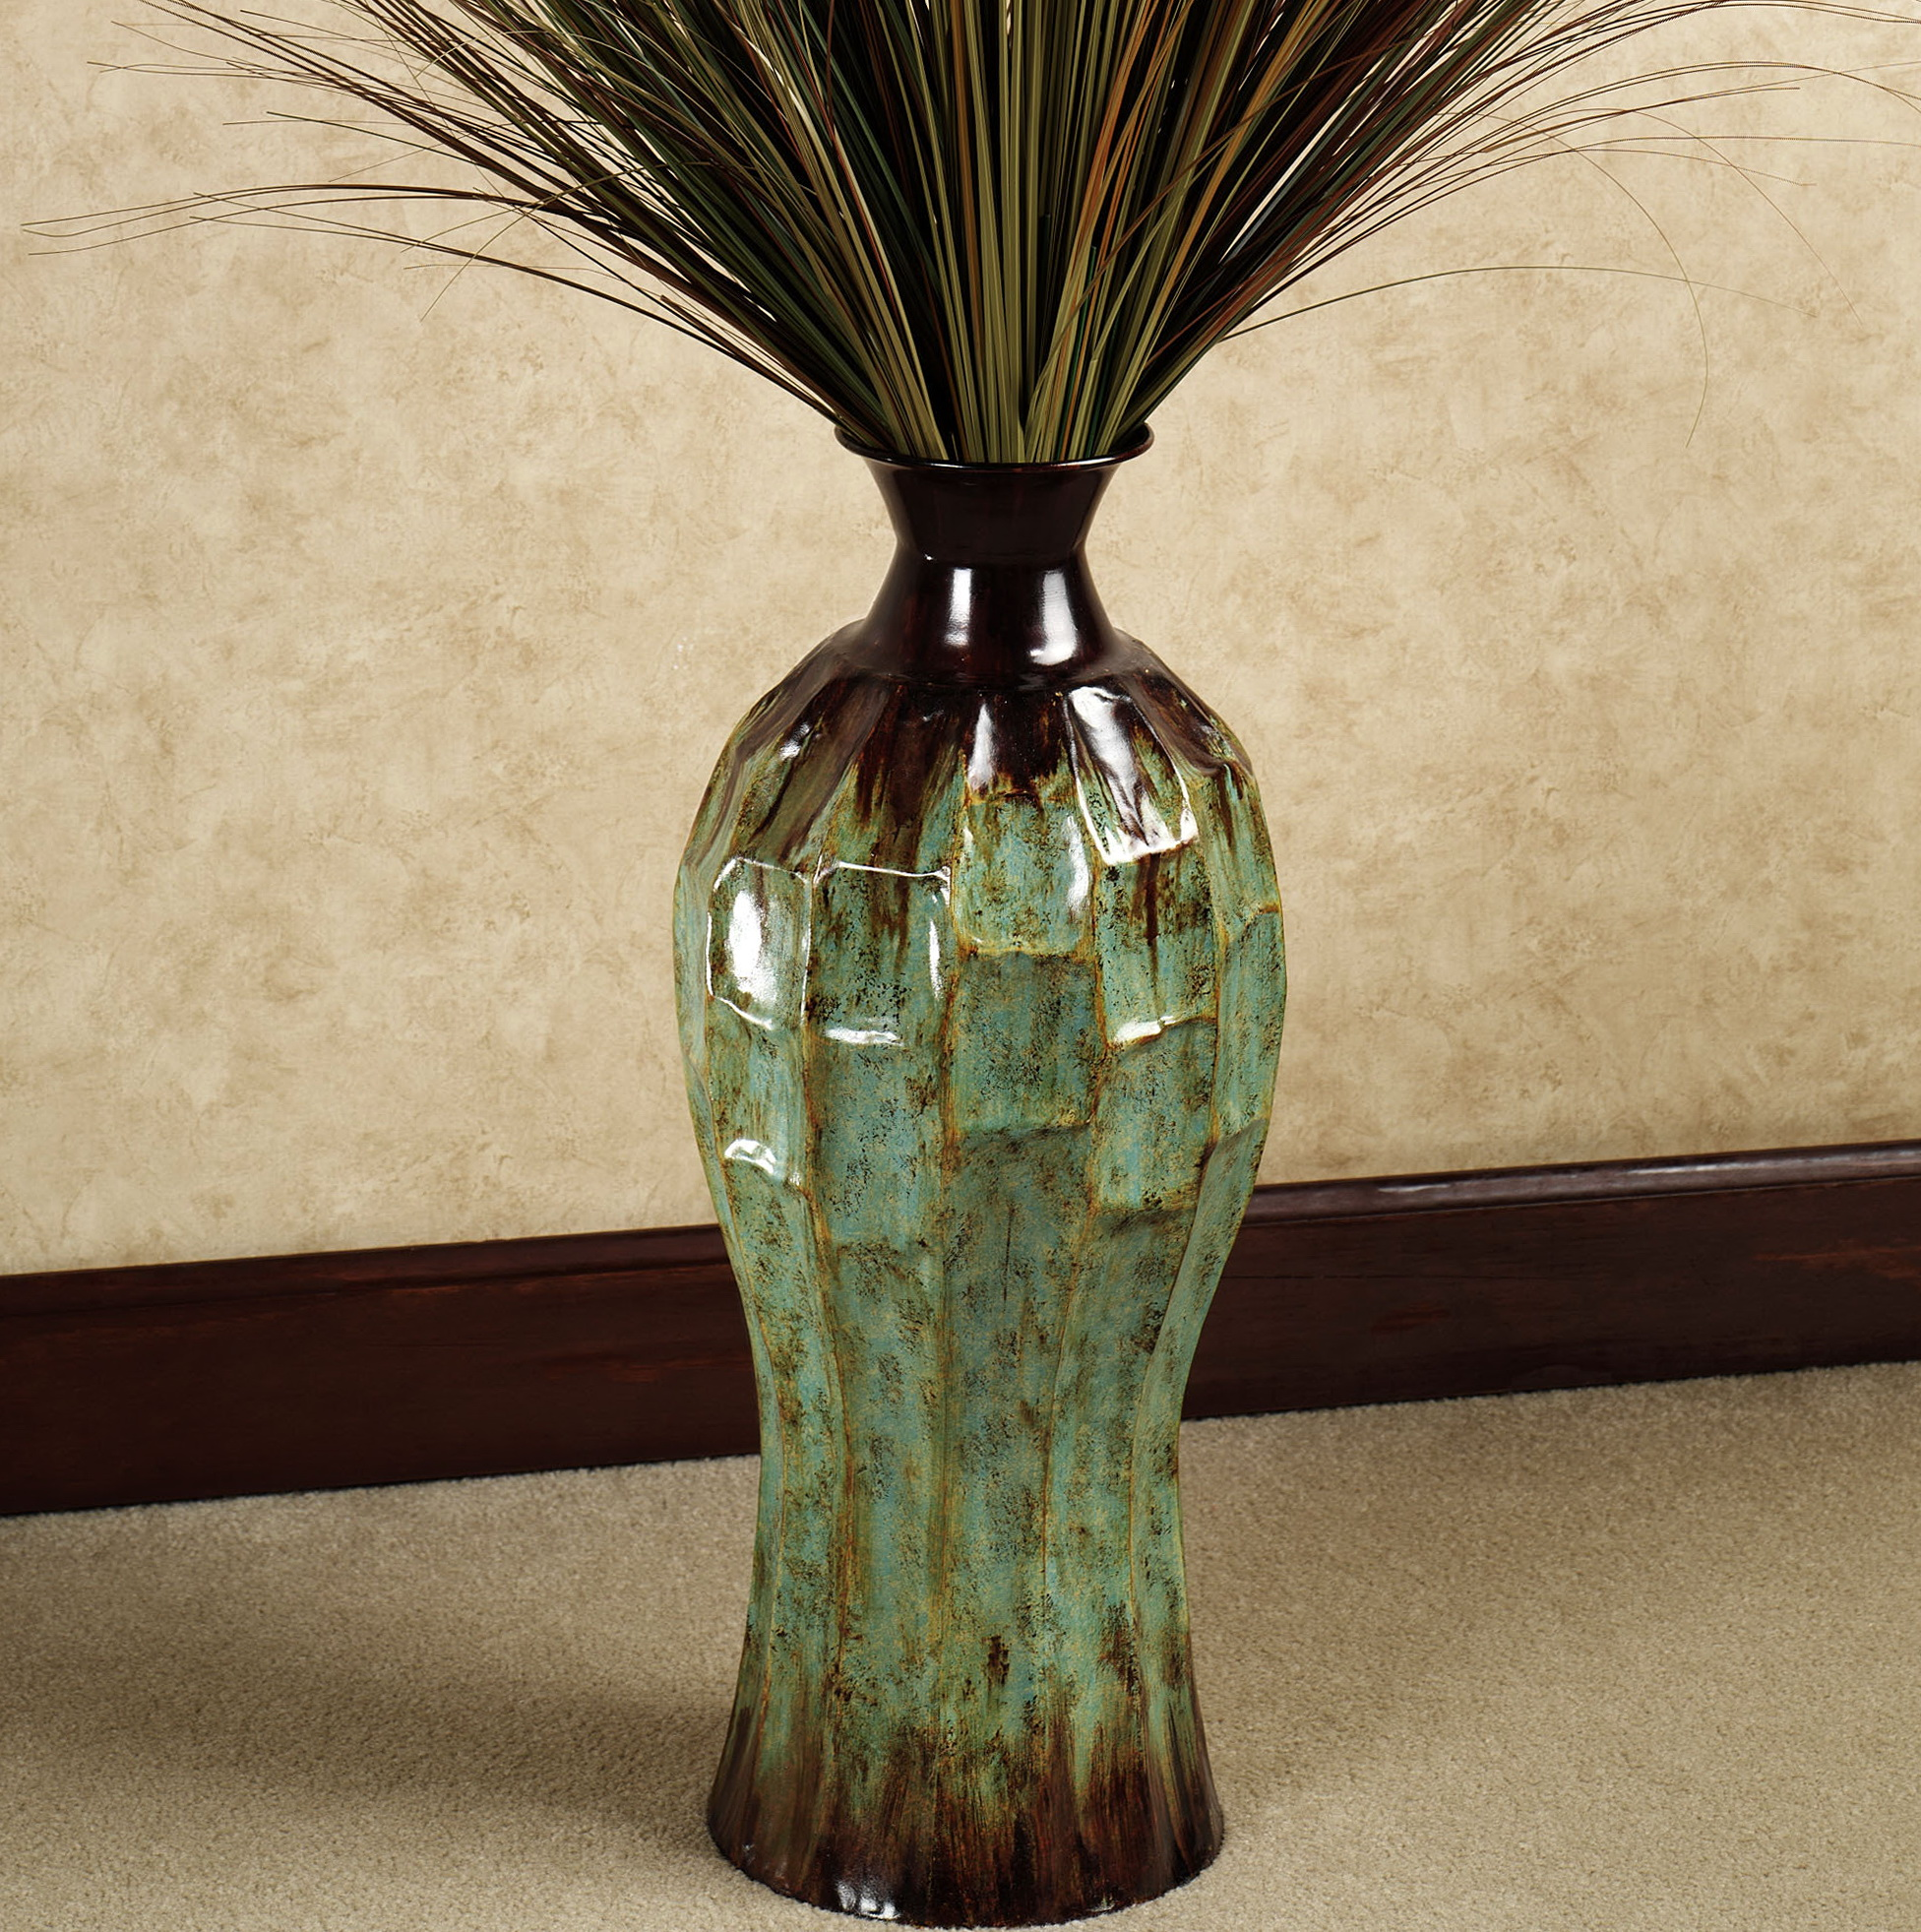 Large Floor Vase Filler Ideas Home Design Ideas